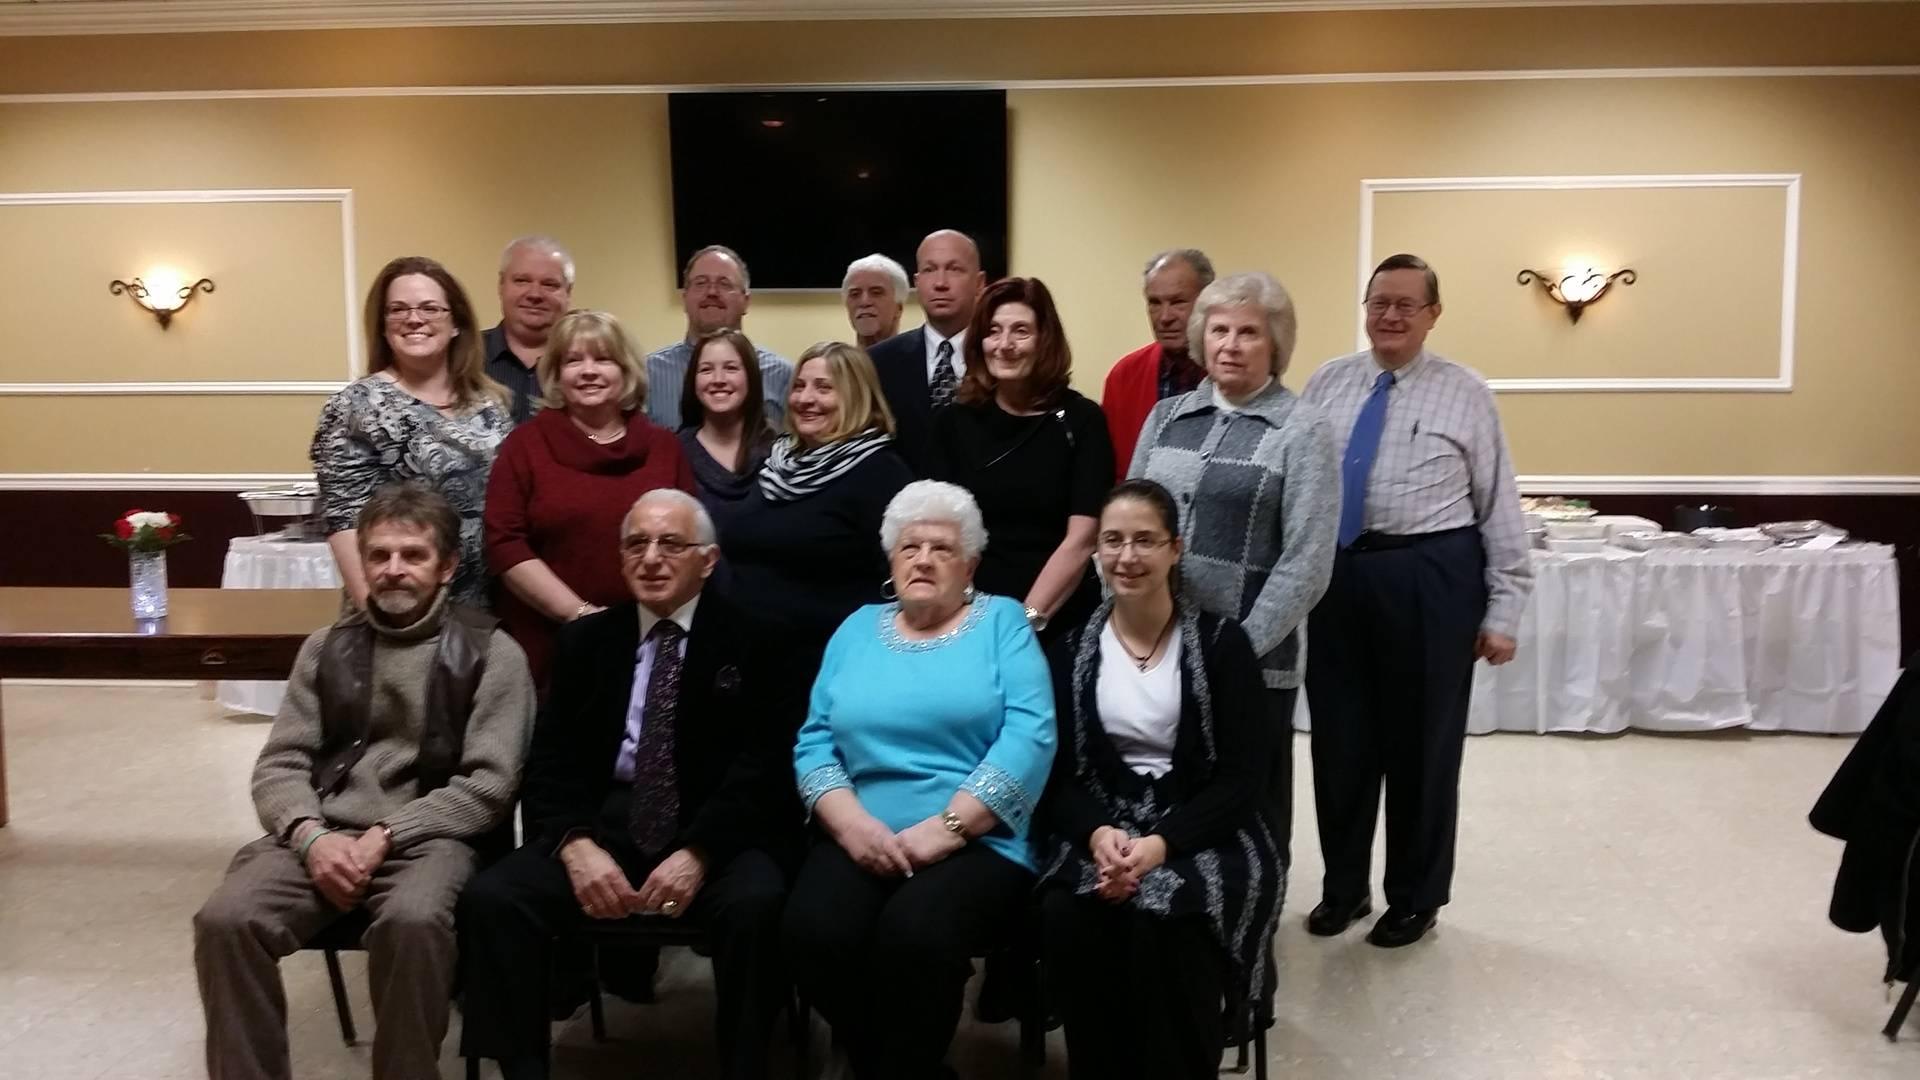 2015 Board of Directors